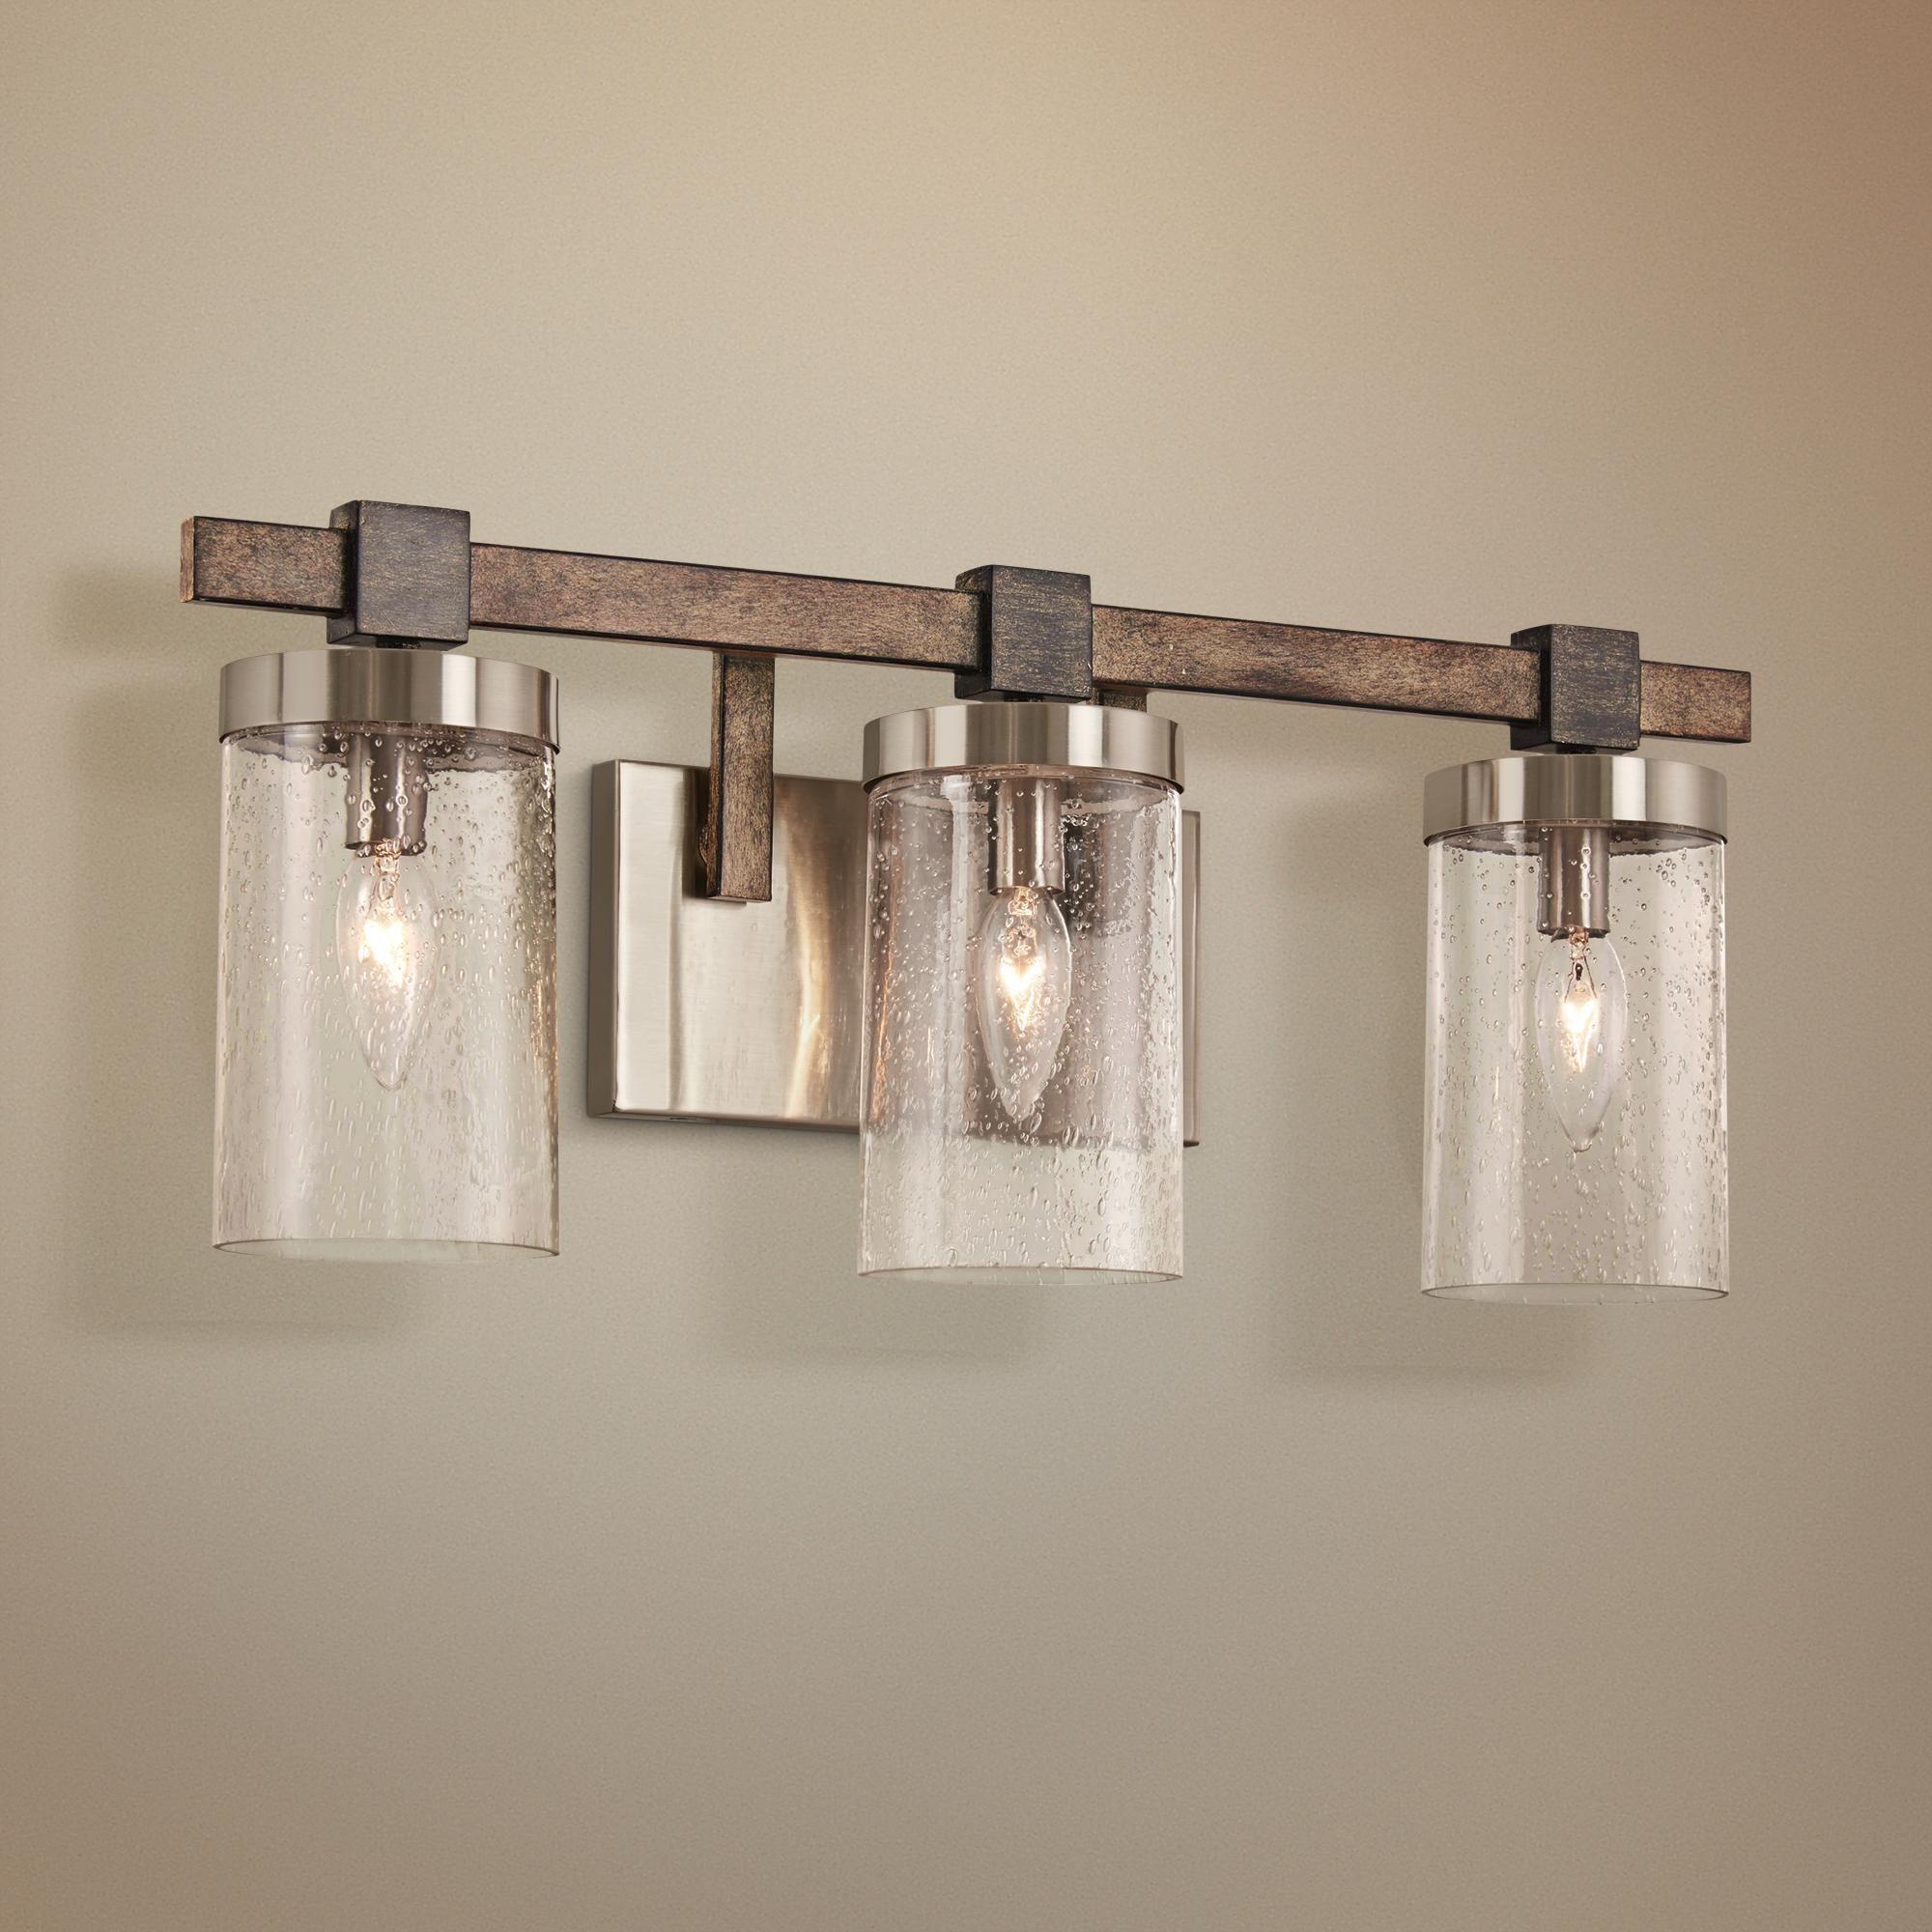 Bathroom Lighting Bridlewood 22 1 2 Wide Brushed Nickel 3 Light Bath Light In 2020 Modern Bathroom Decor Bathroom Decor Bathroom Light Fixtures